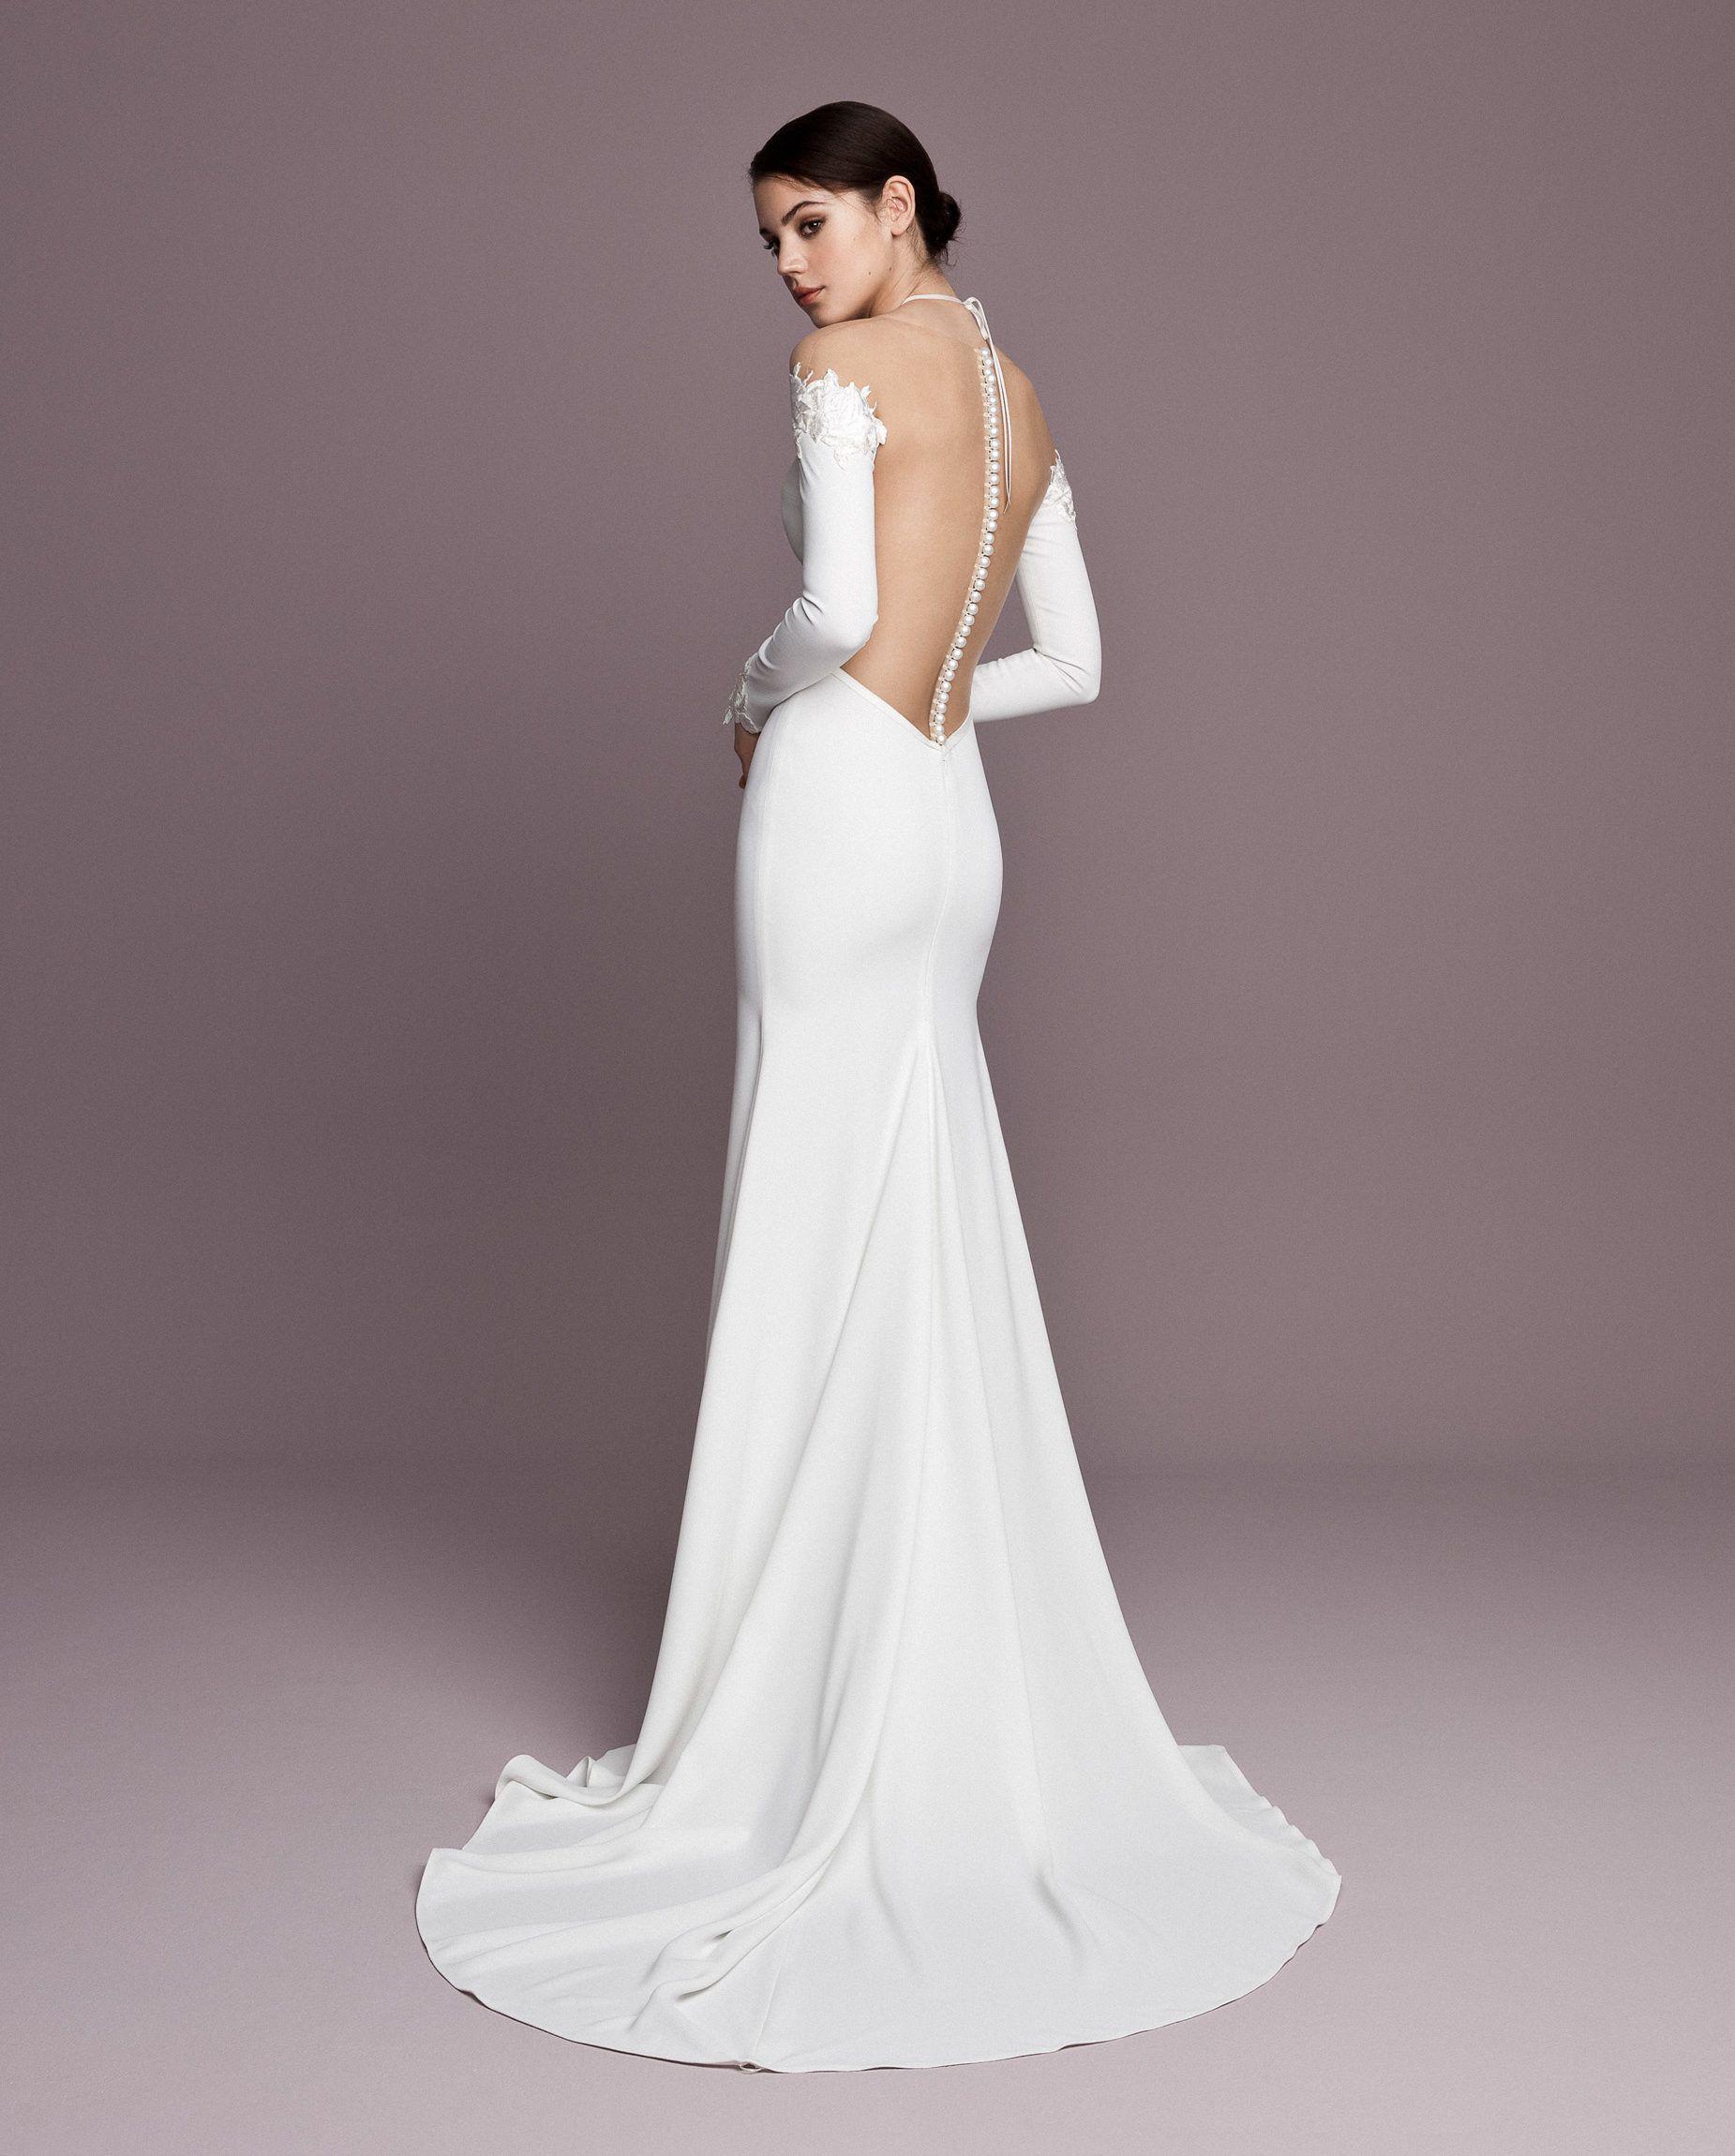 Daalarna menyasszonyi ruha – Sunset kollekció (fotó  daalarna.hu) f09f0bef36